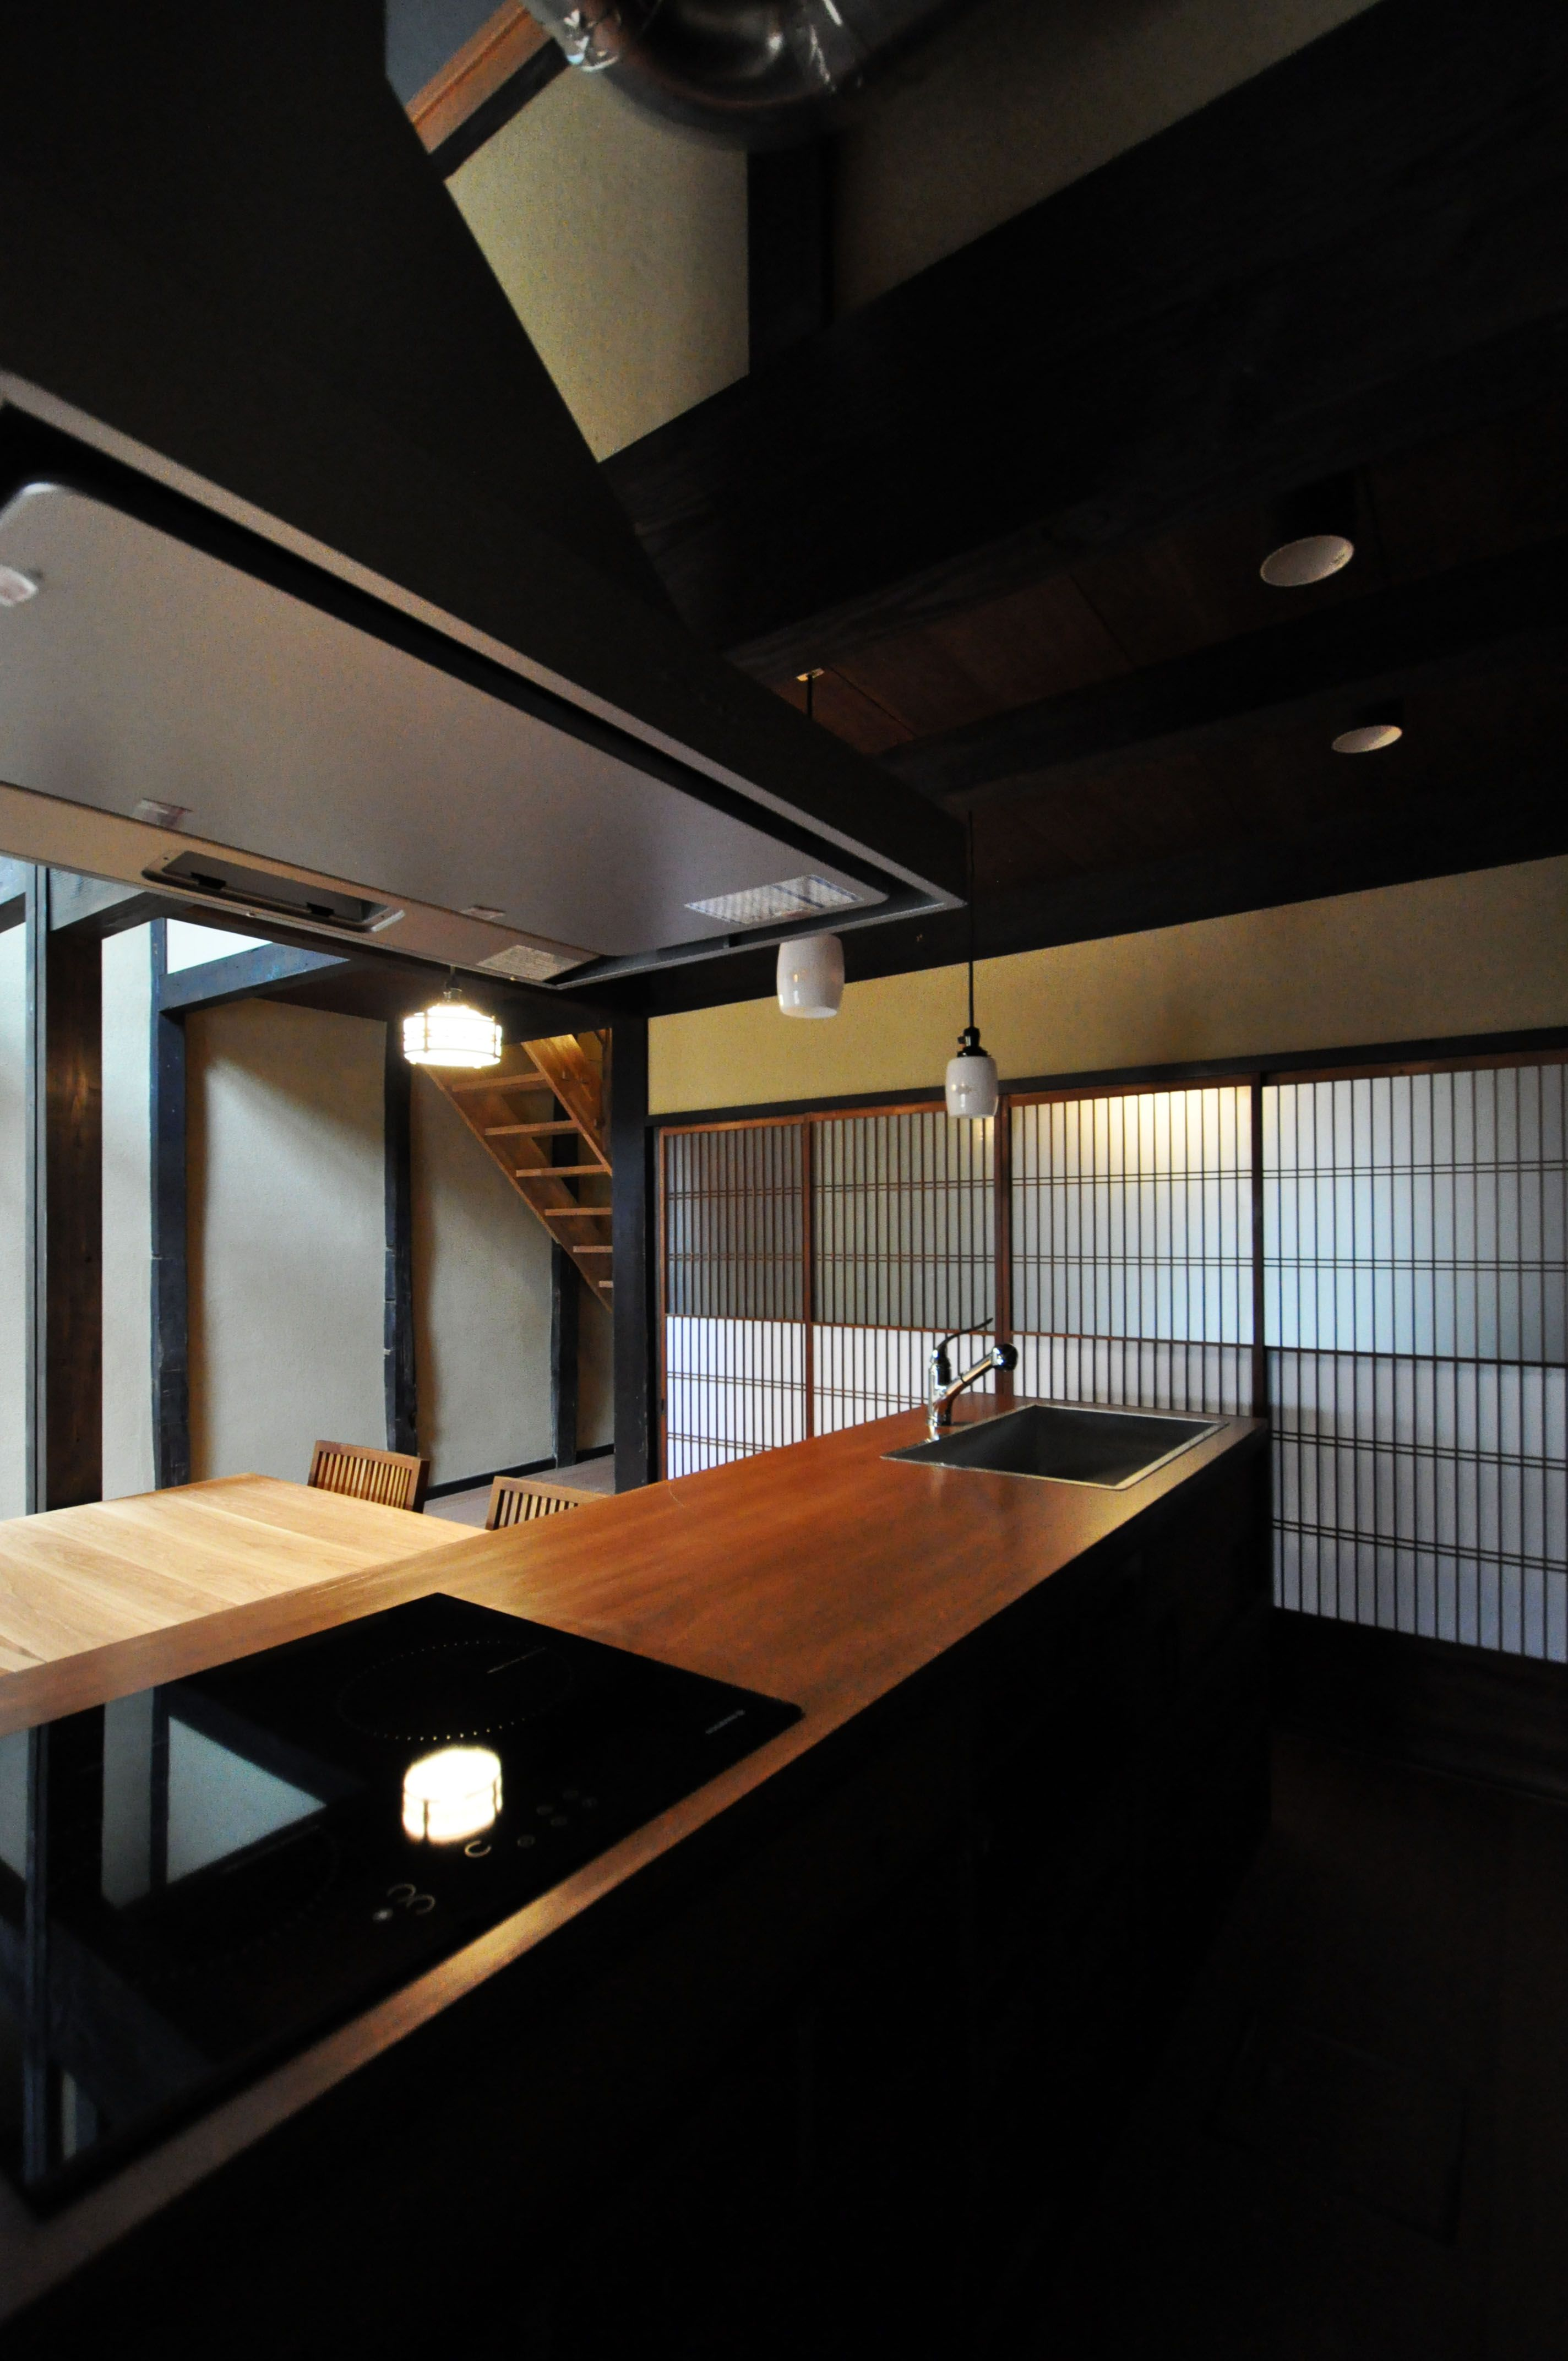 japan kyoto nishijin kyomachiya japanese home design japanese interior design japanese home on kitchen interior japan id=88592